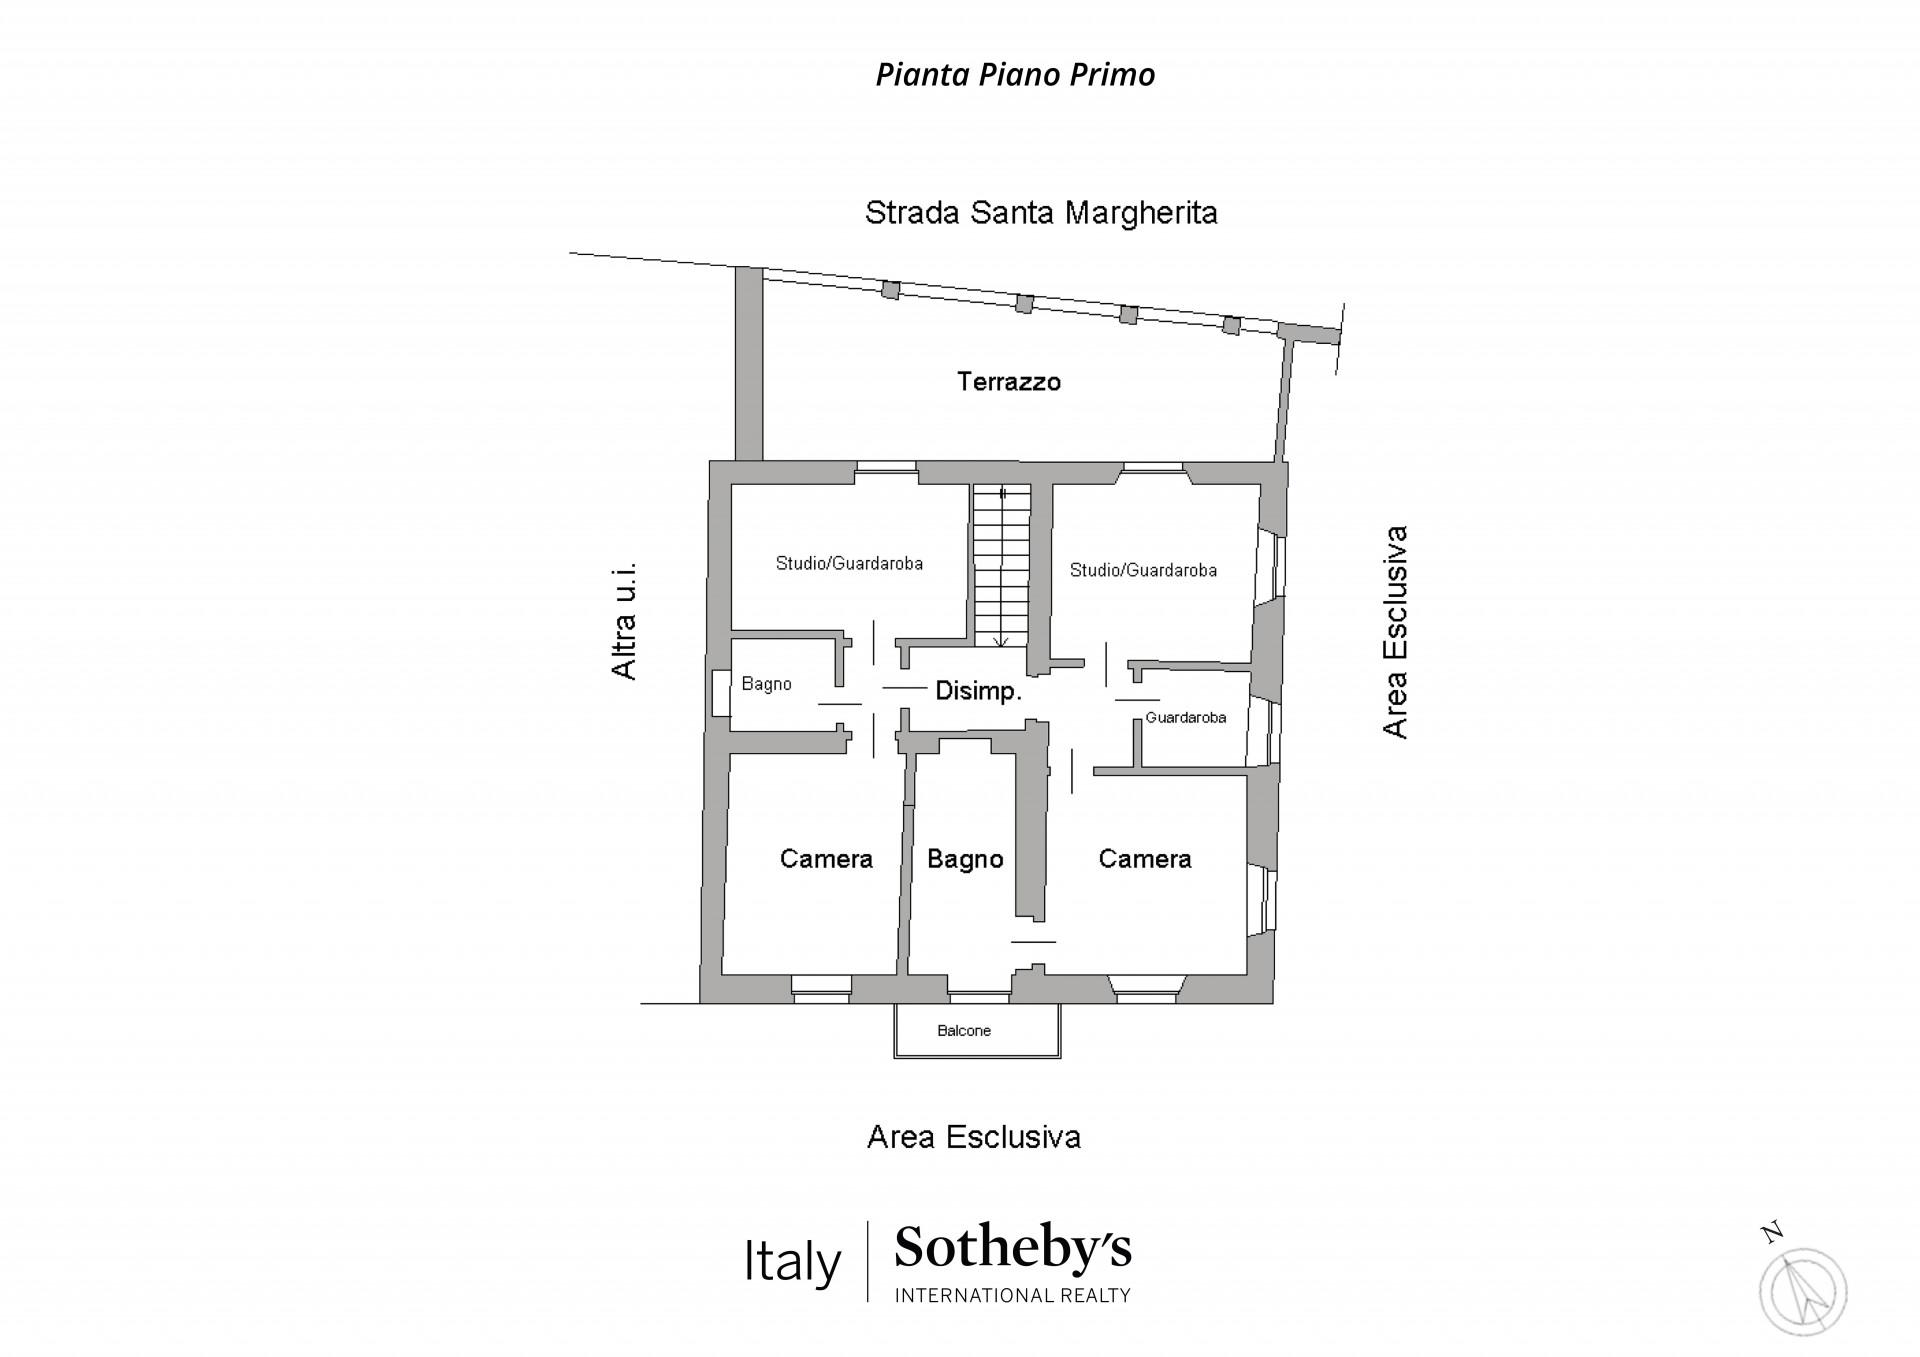 Casa indipendente in Vendita a Torino: 5 locali, 270 mq - Foto 23